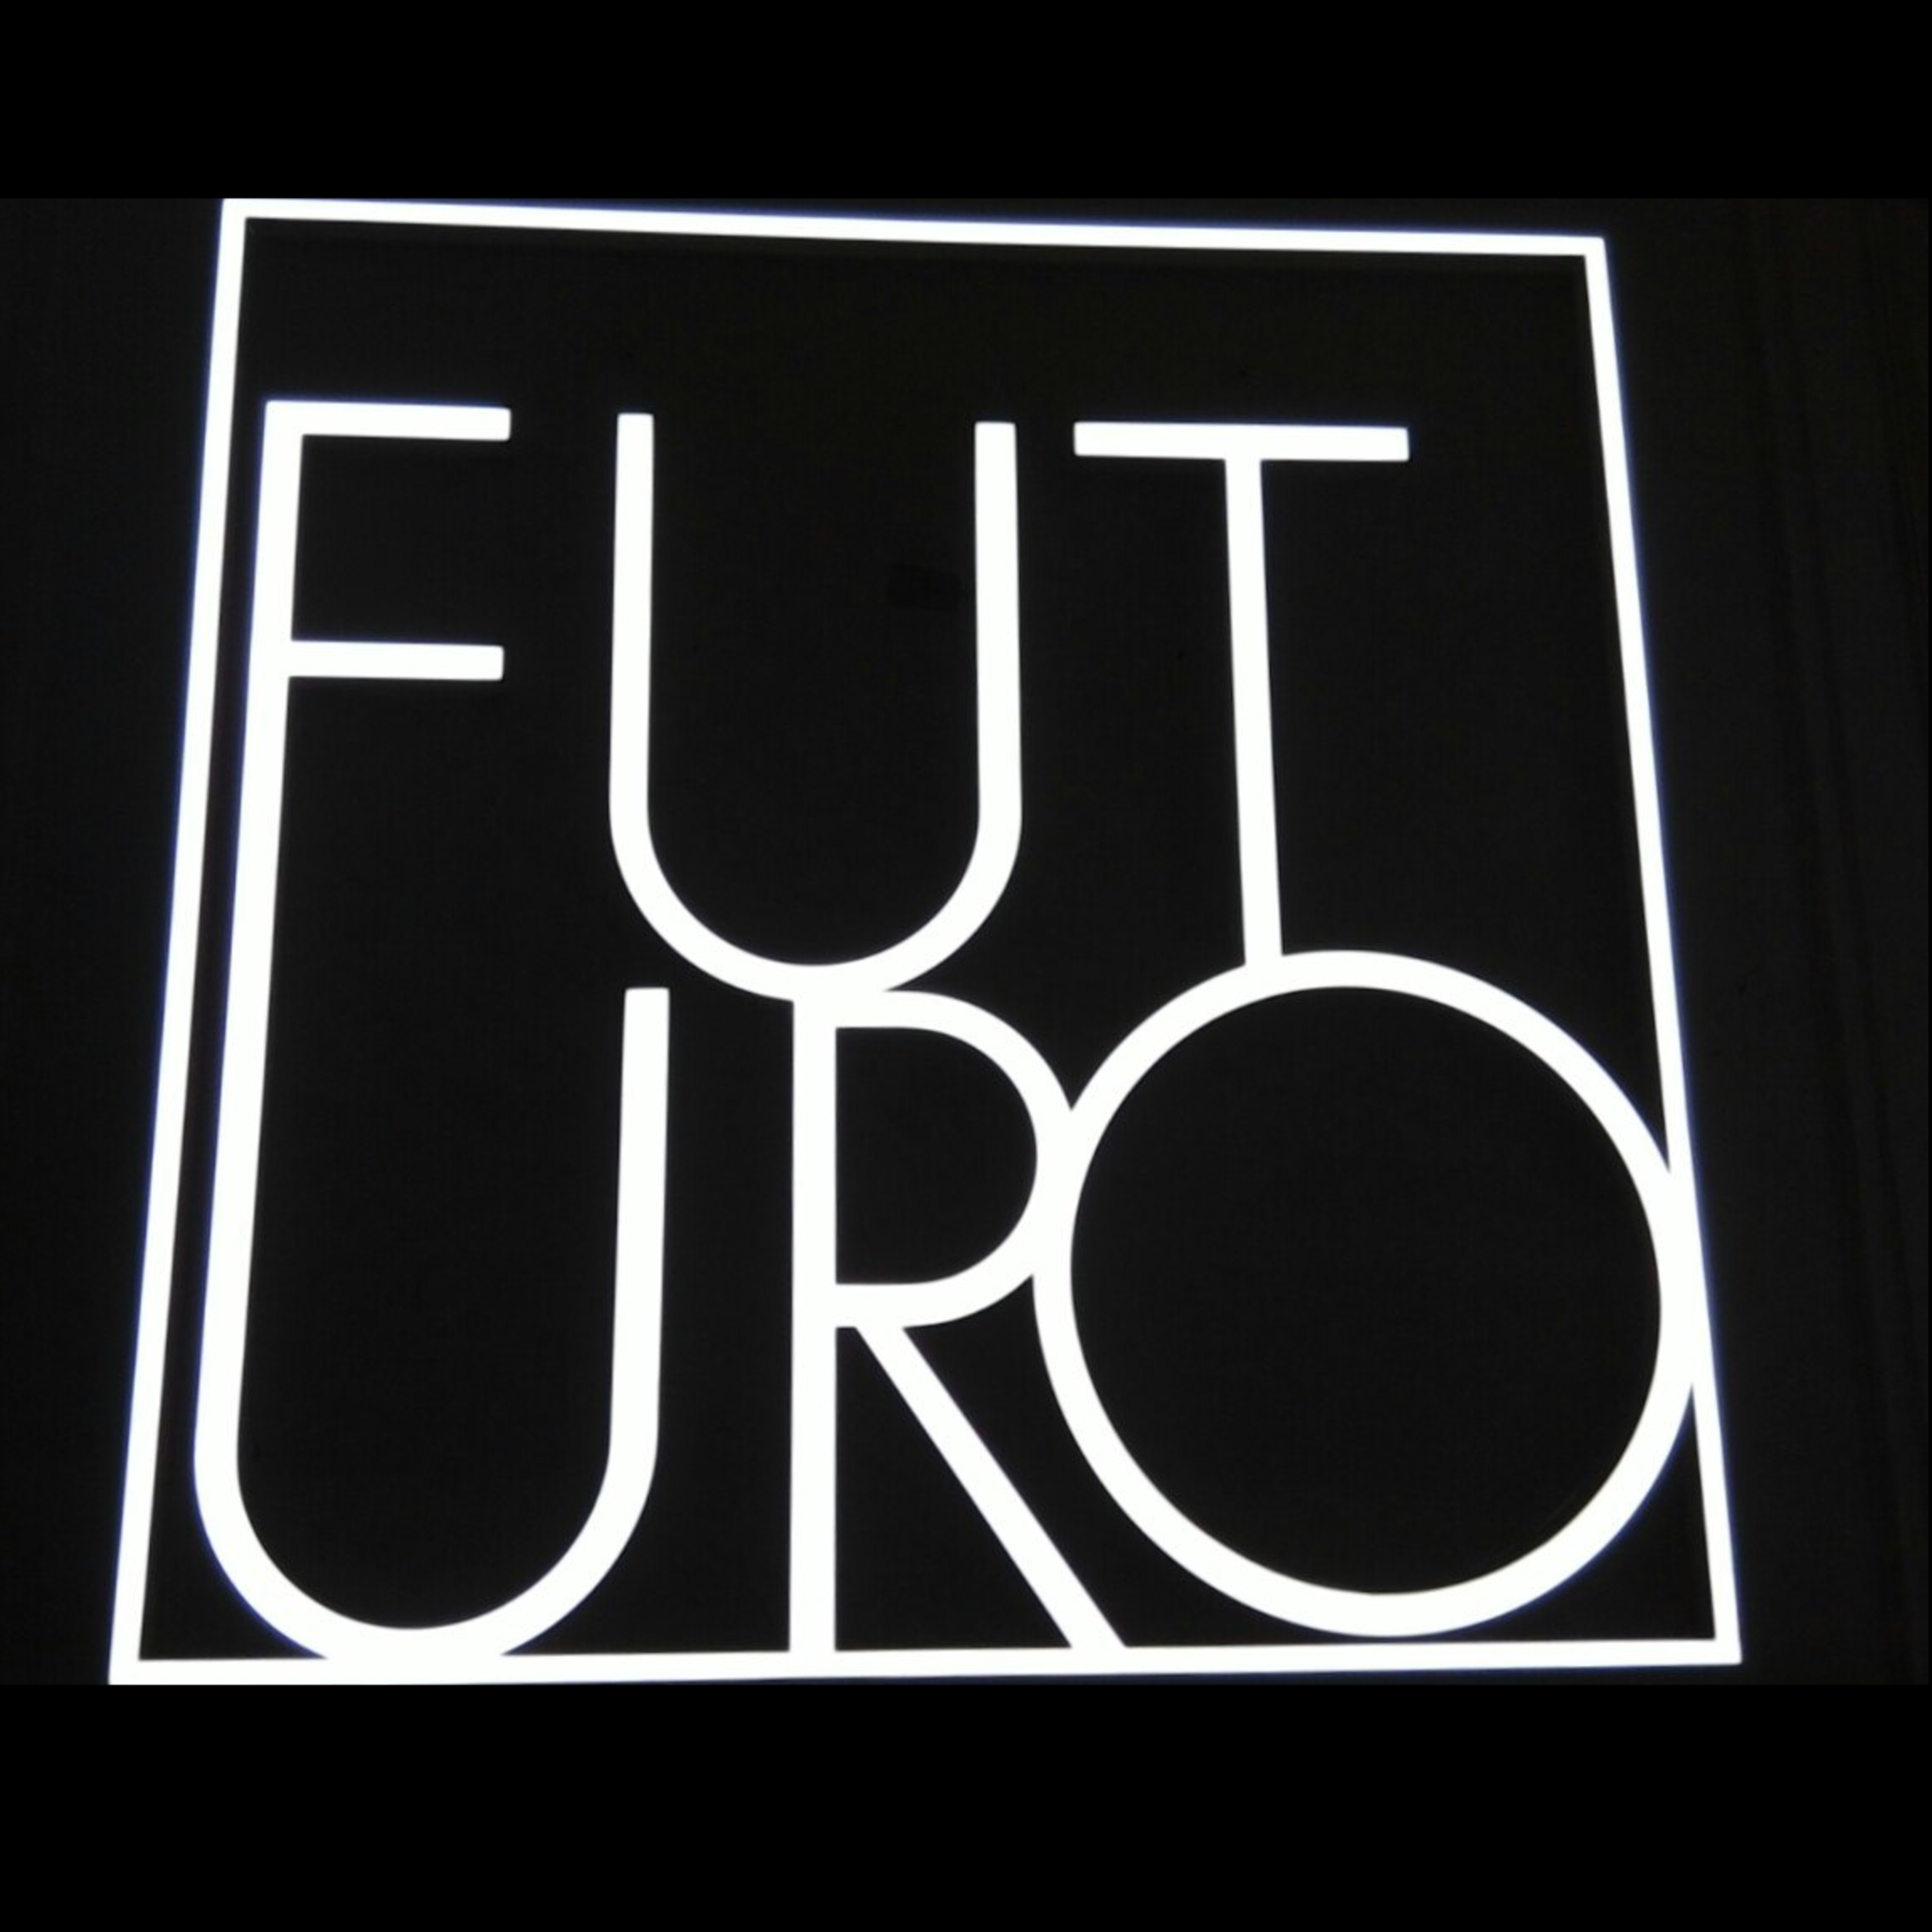 Галерея FUTURO